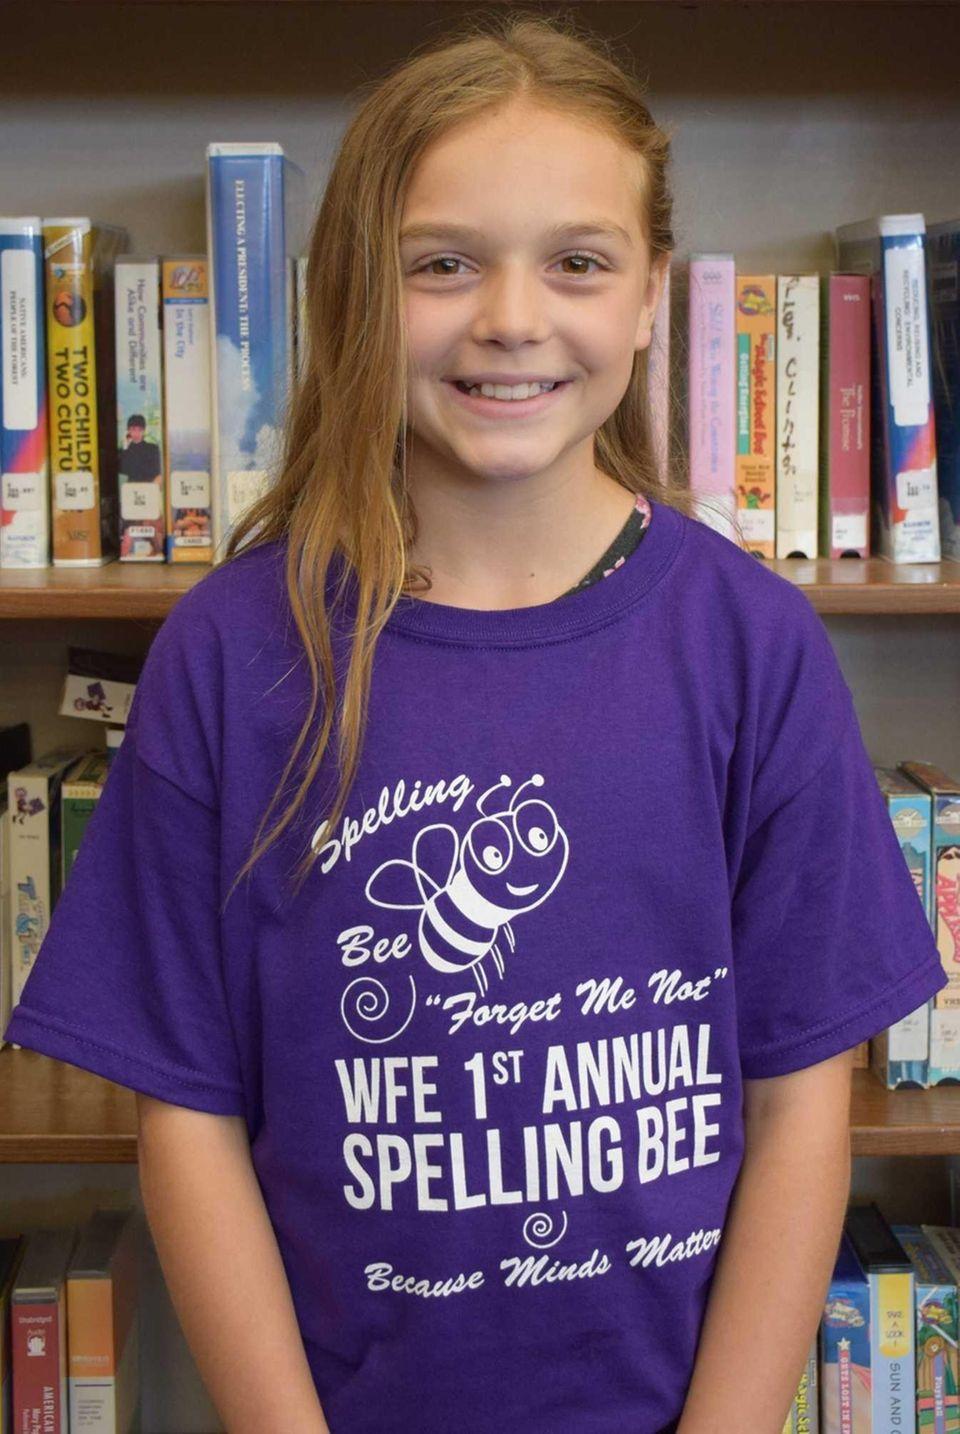 Krista Cusimano, 11, a fifth-grader at William Floyd